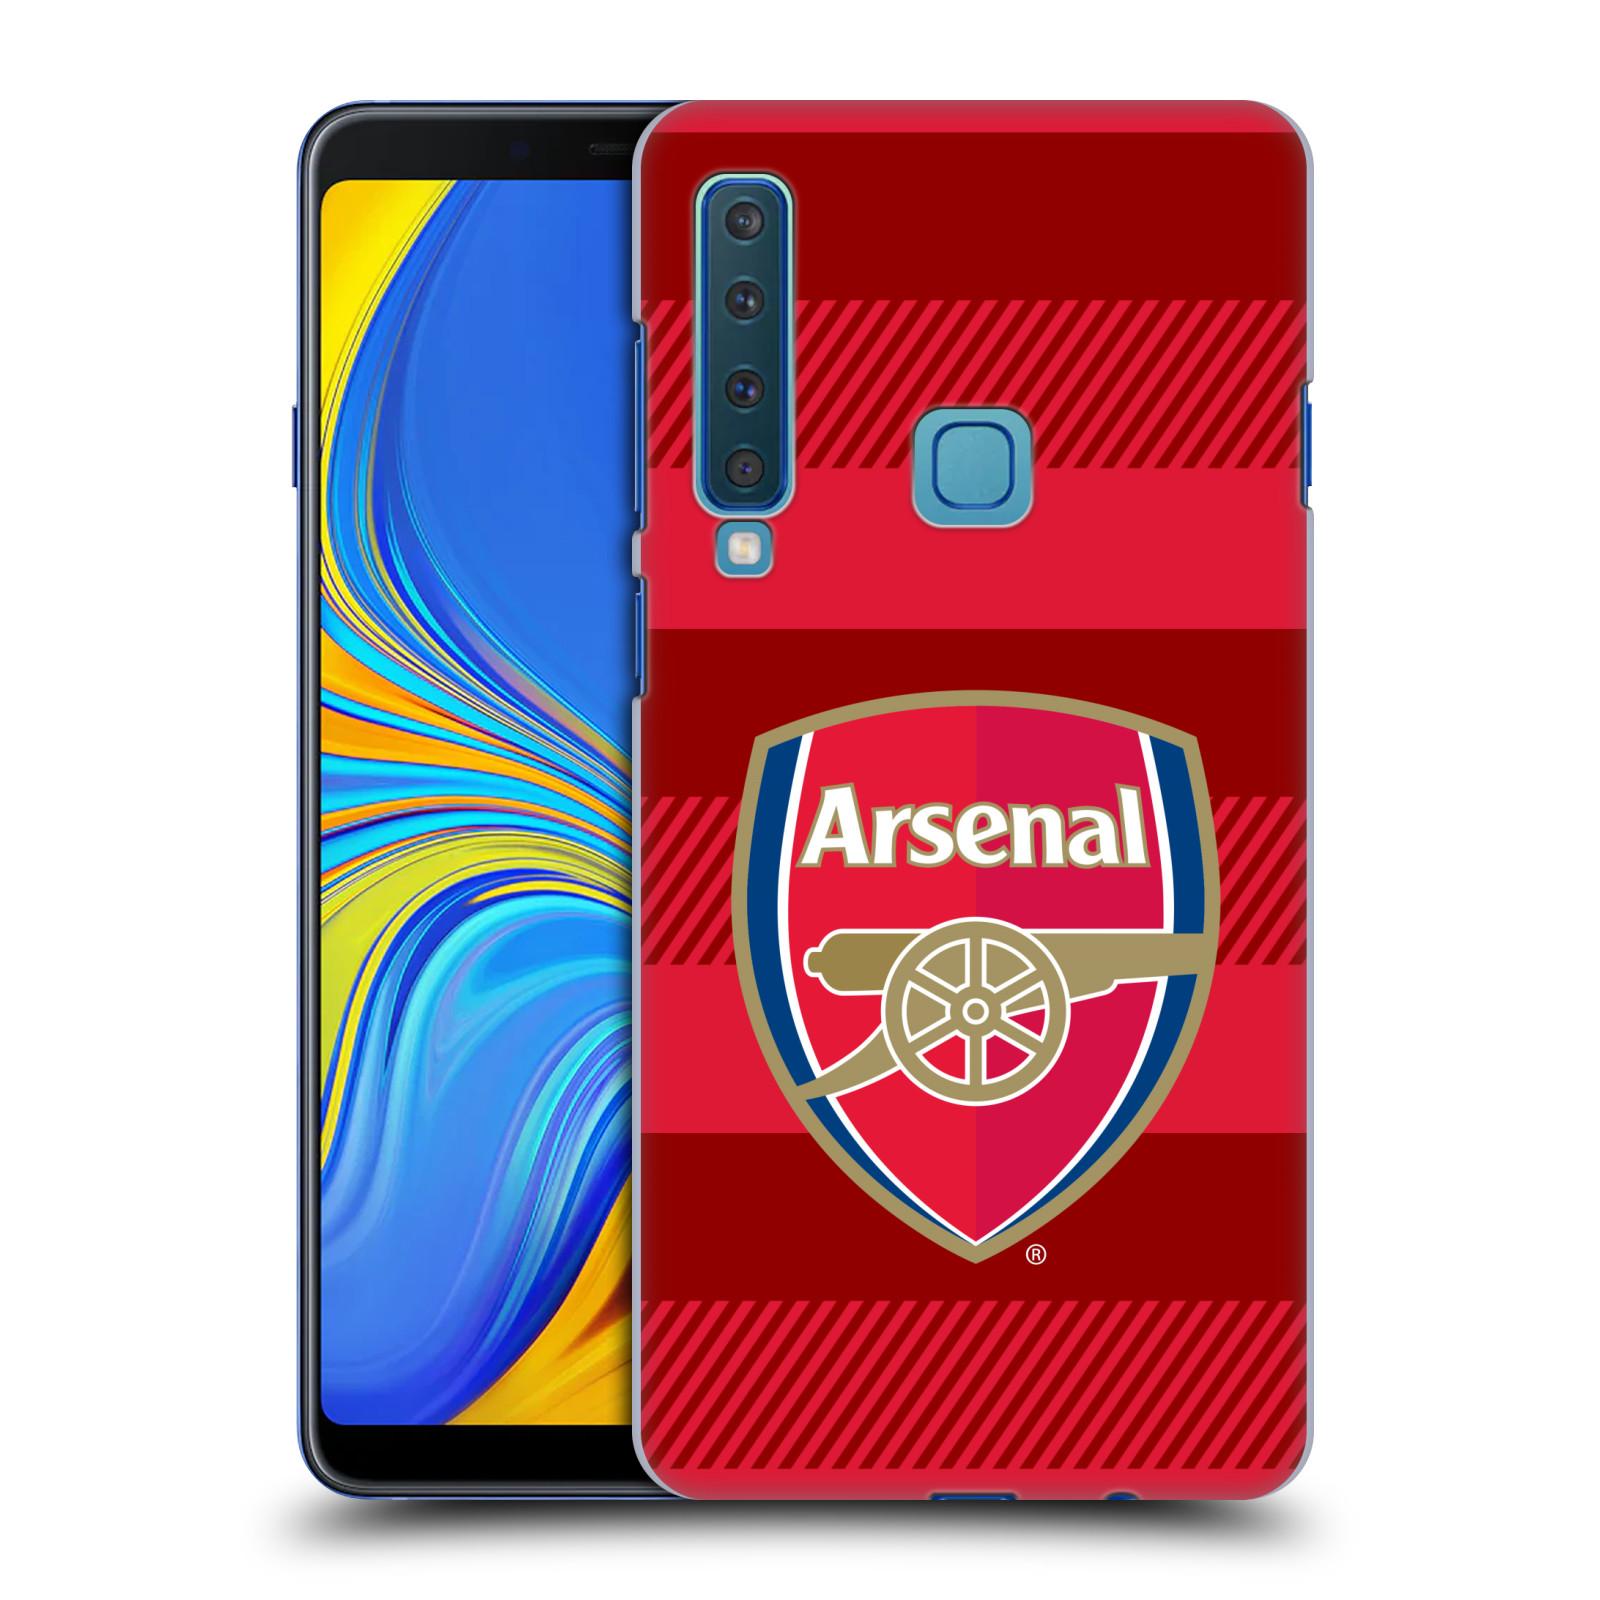 Plastové pouzdro na mobil Samsung Galaxy A9 (2018) - Head Case - Arsenal FC - Logo s pruhy